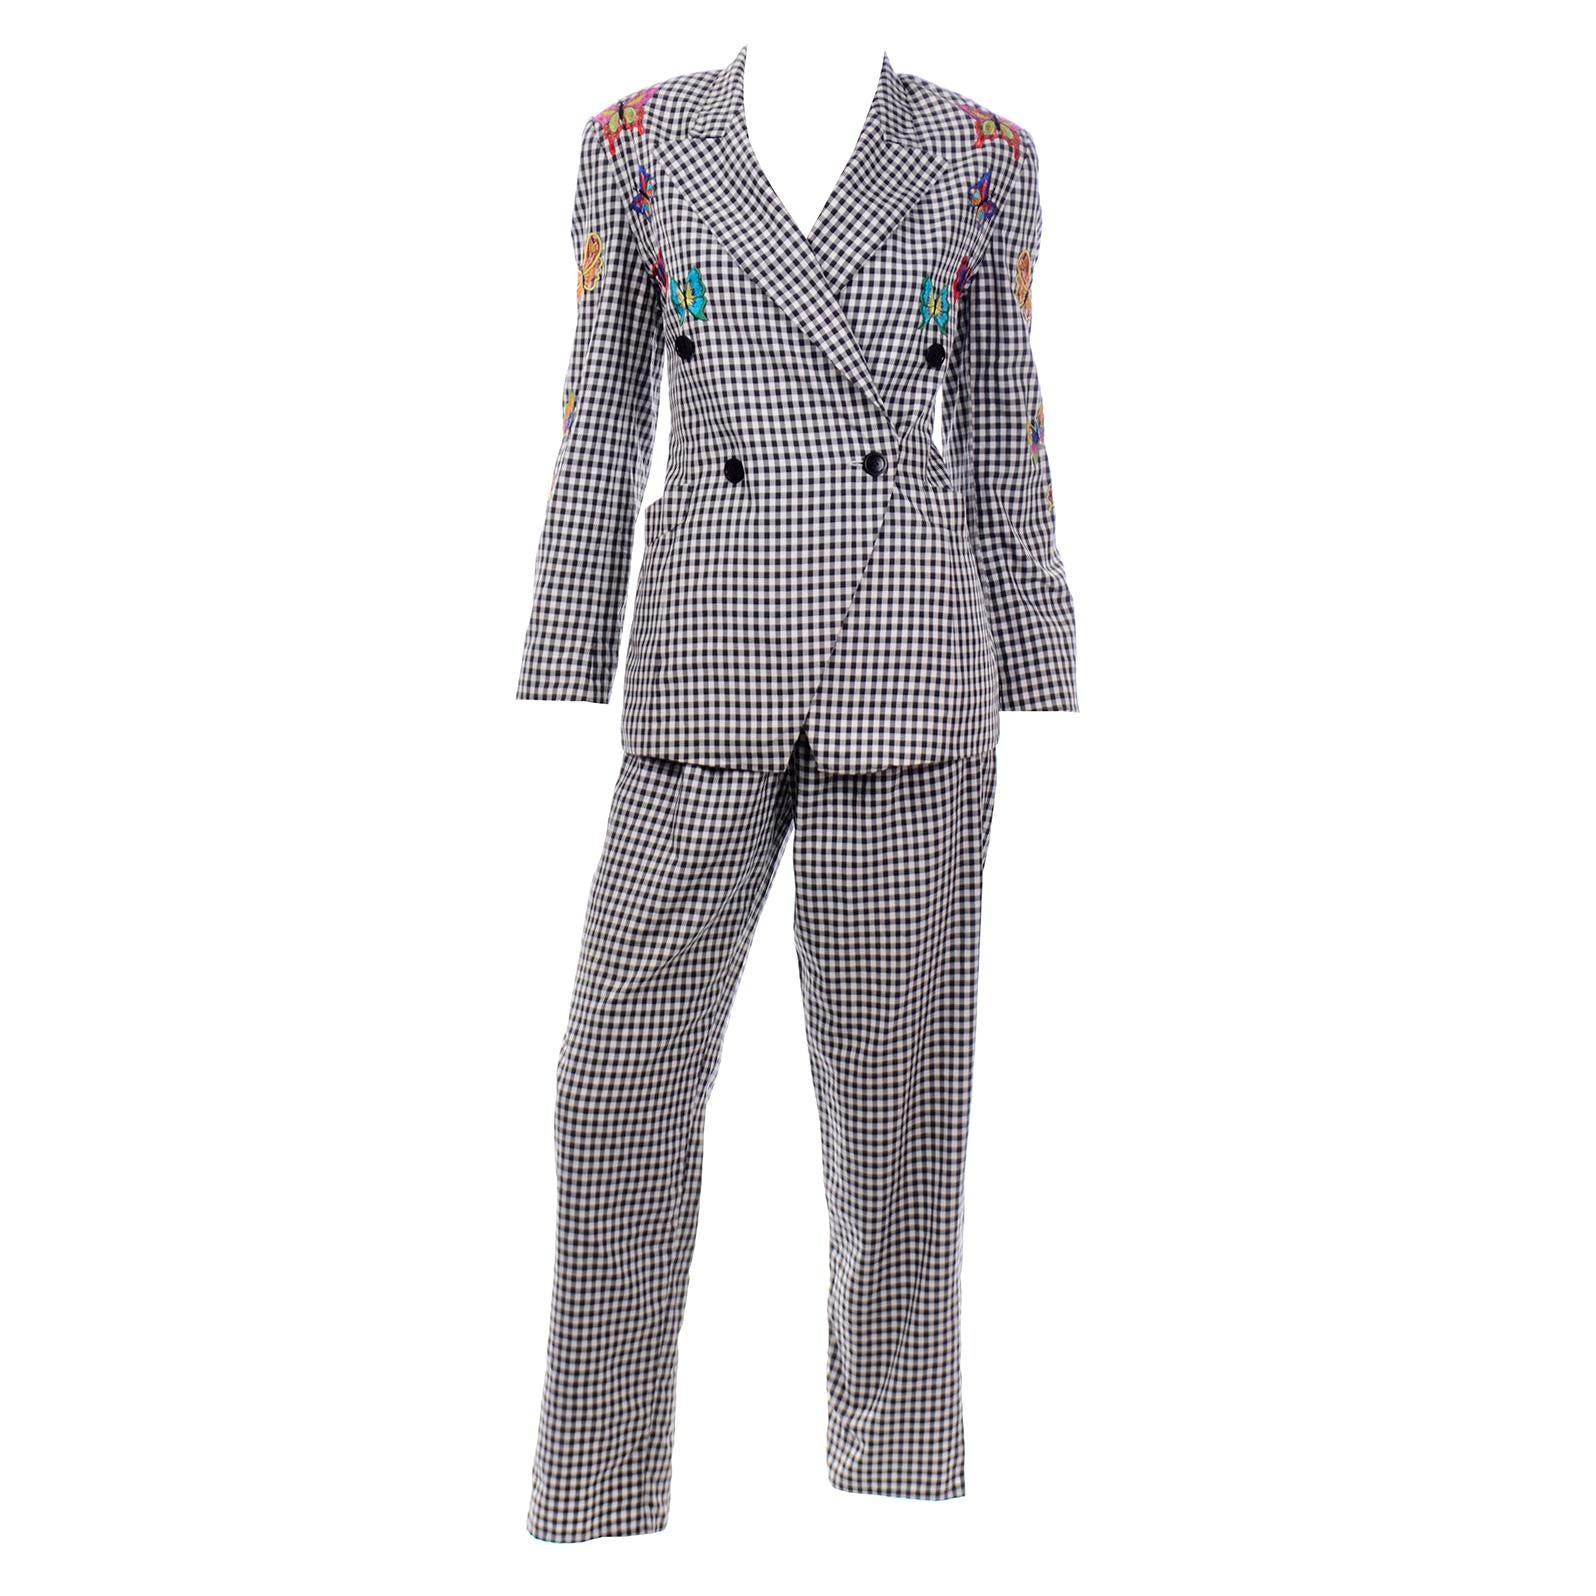 Vintage Escada Black & White Gingham Check Butterfly Applique Jacket & Pant Suit